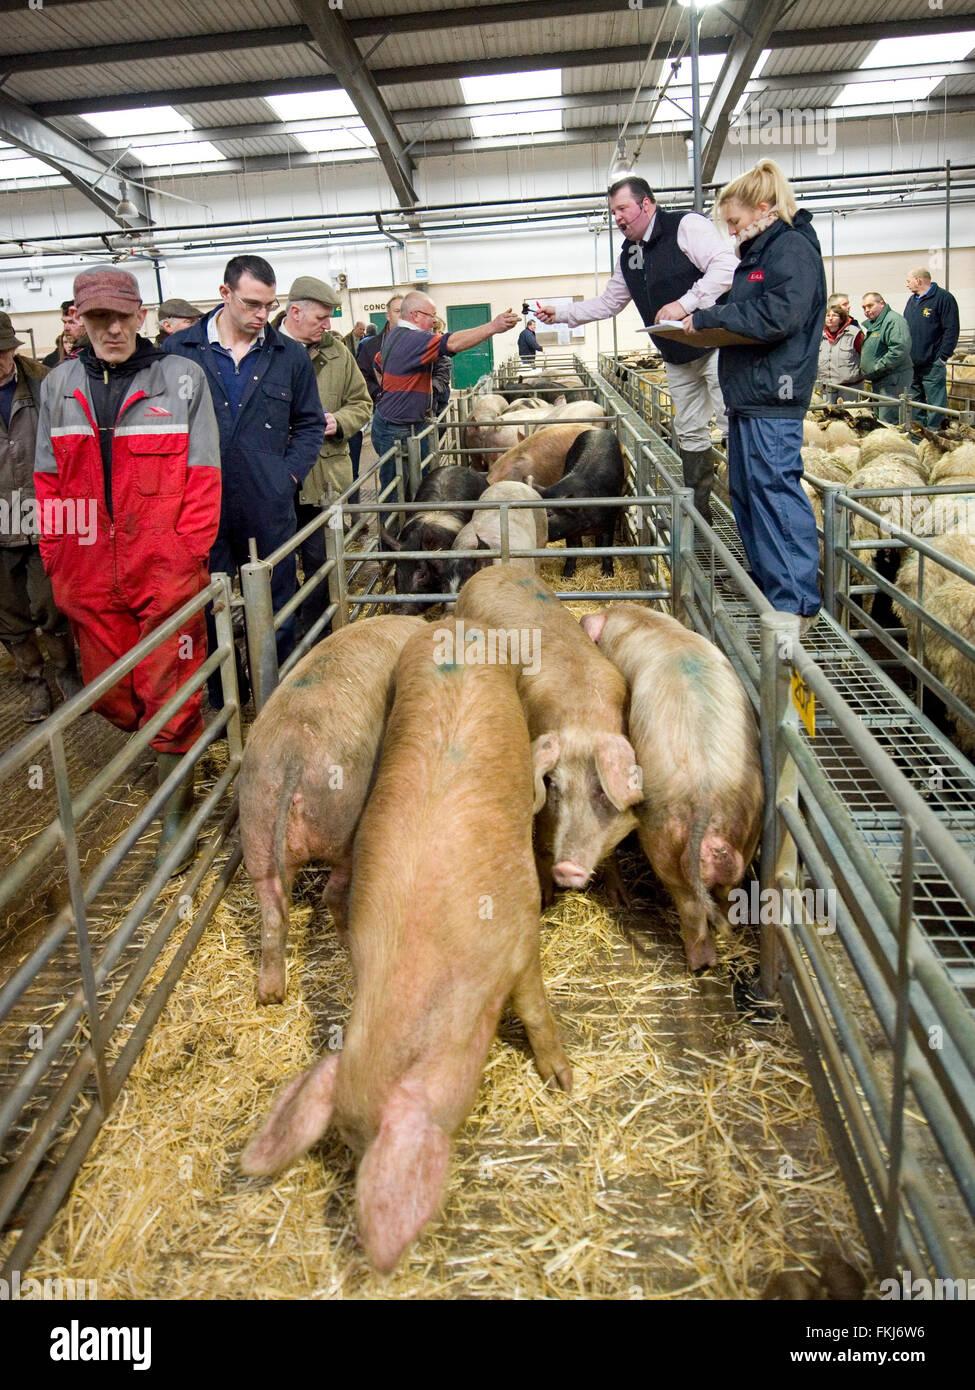 pig livestock auction - Stock Image